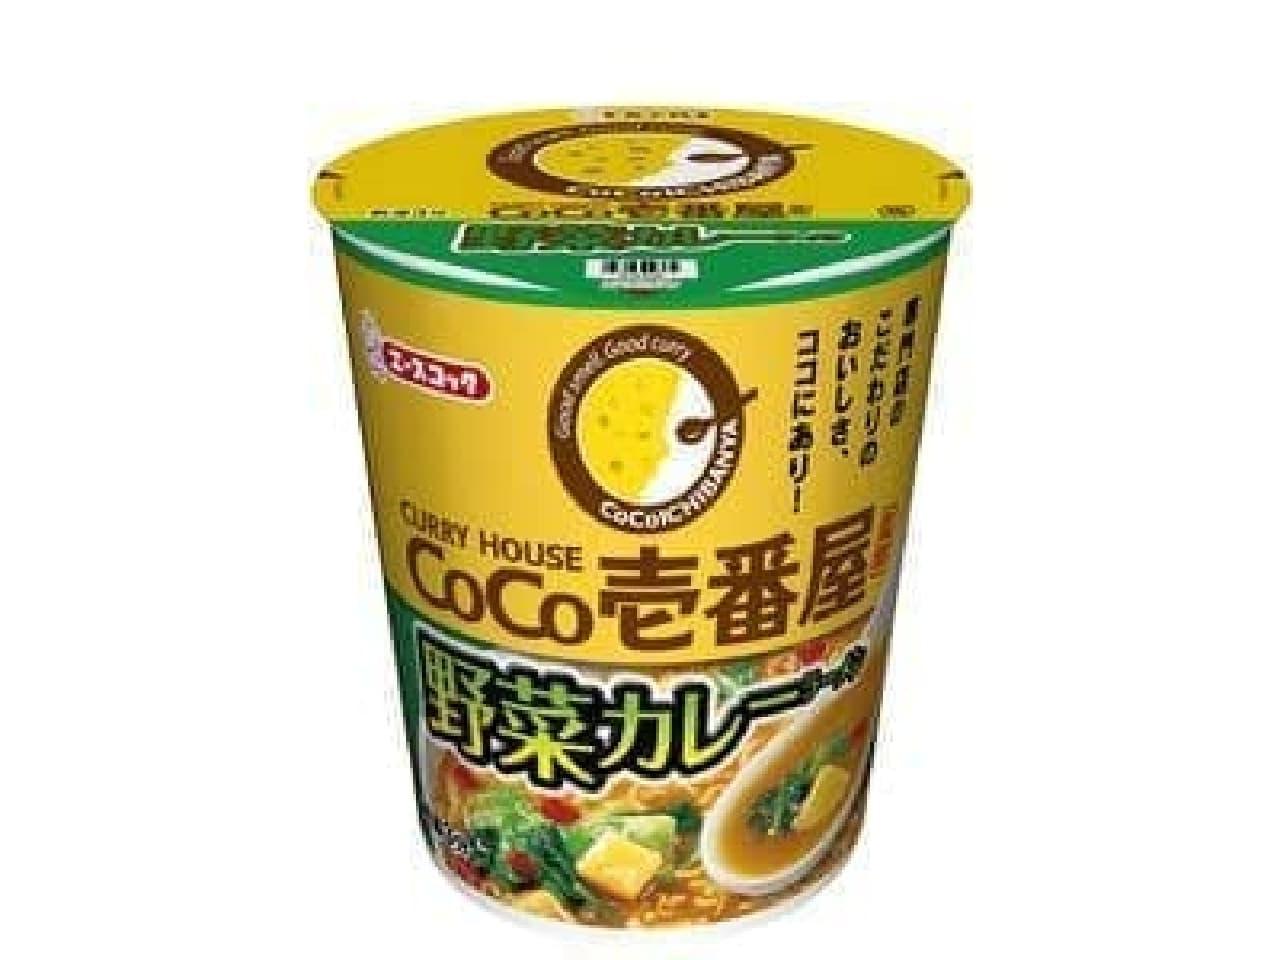 CoCo 壱番屋監修の野菜・牛コクカレーラーメンが新発売!